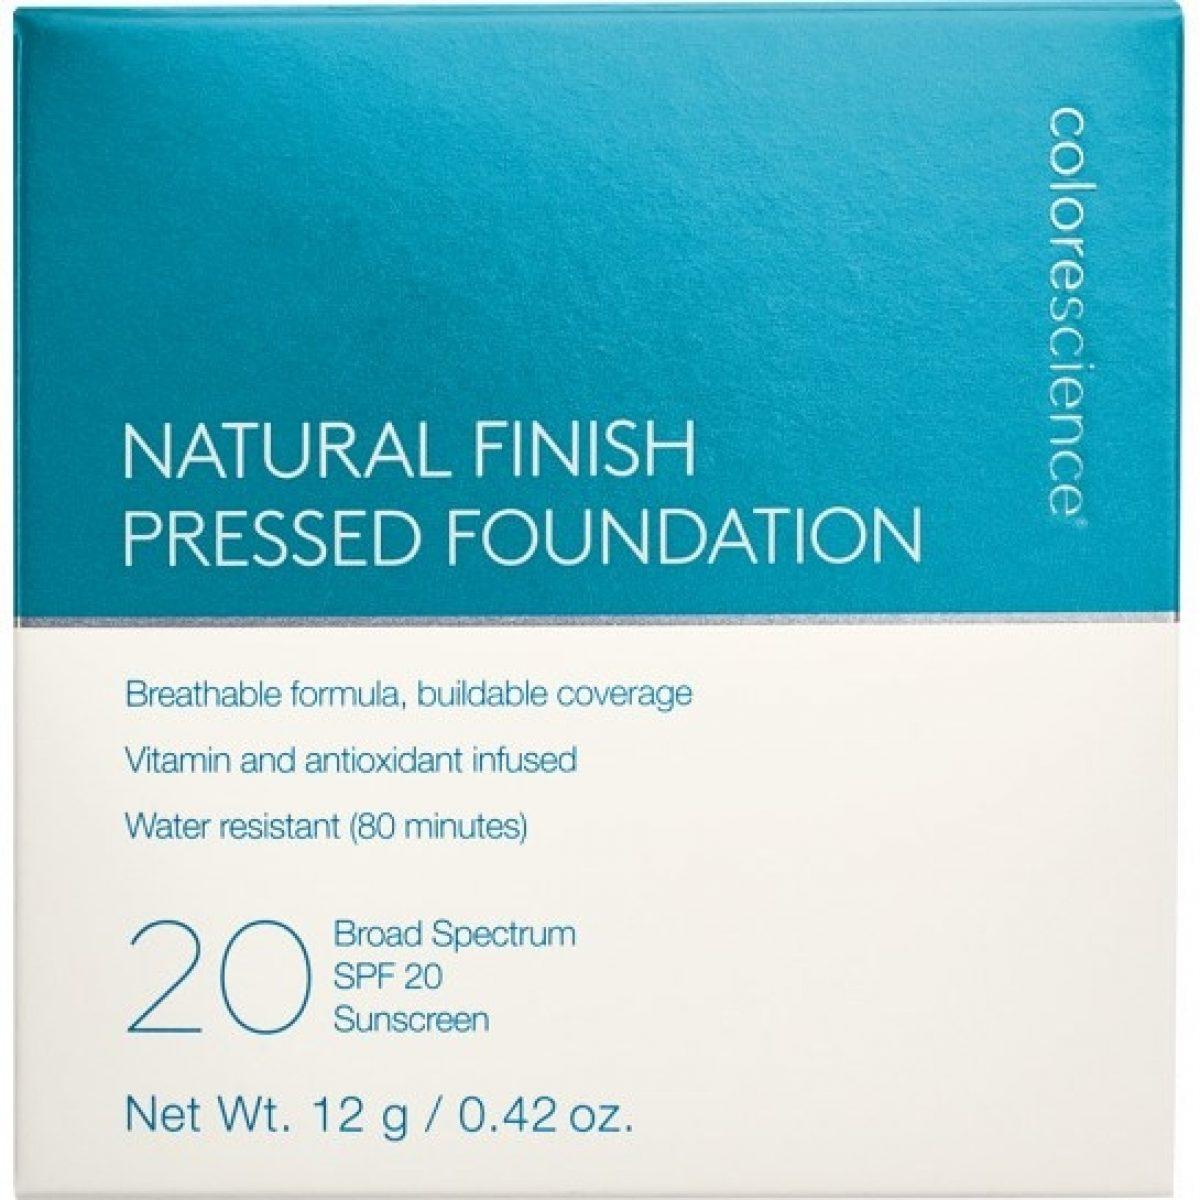 Natural Finish Pressed Foundation SPF 20